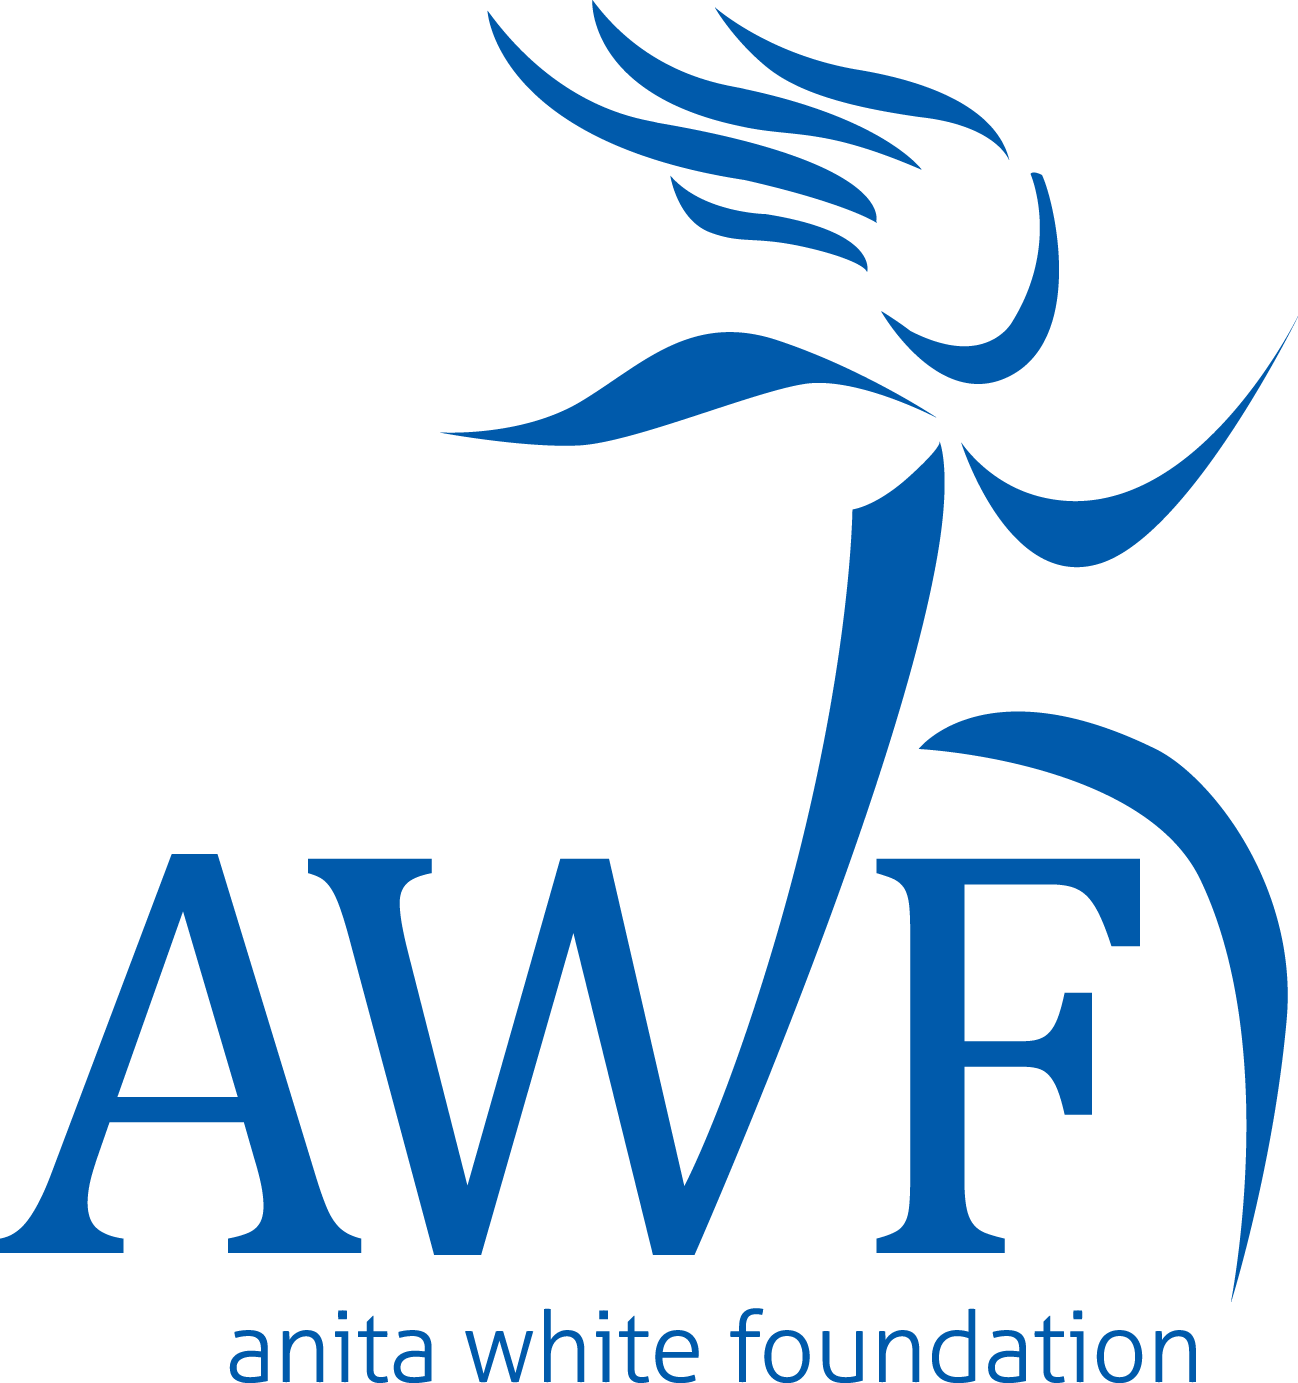 Anita White Foundation logo